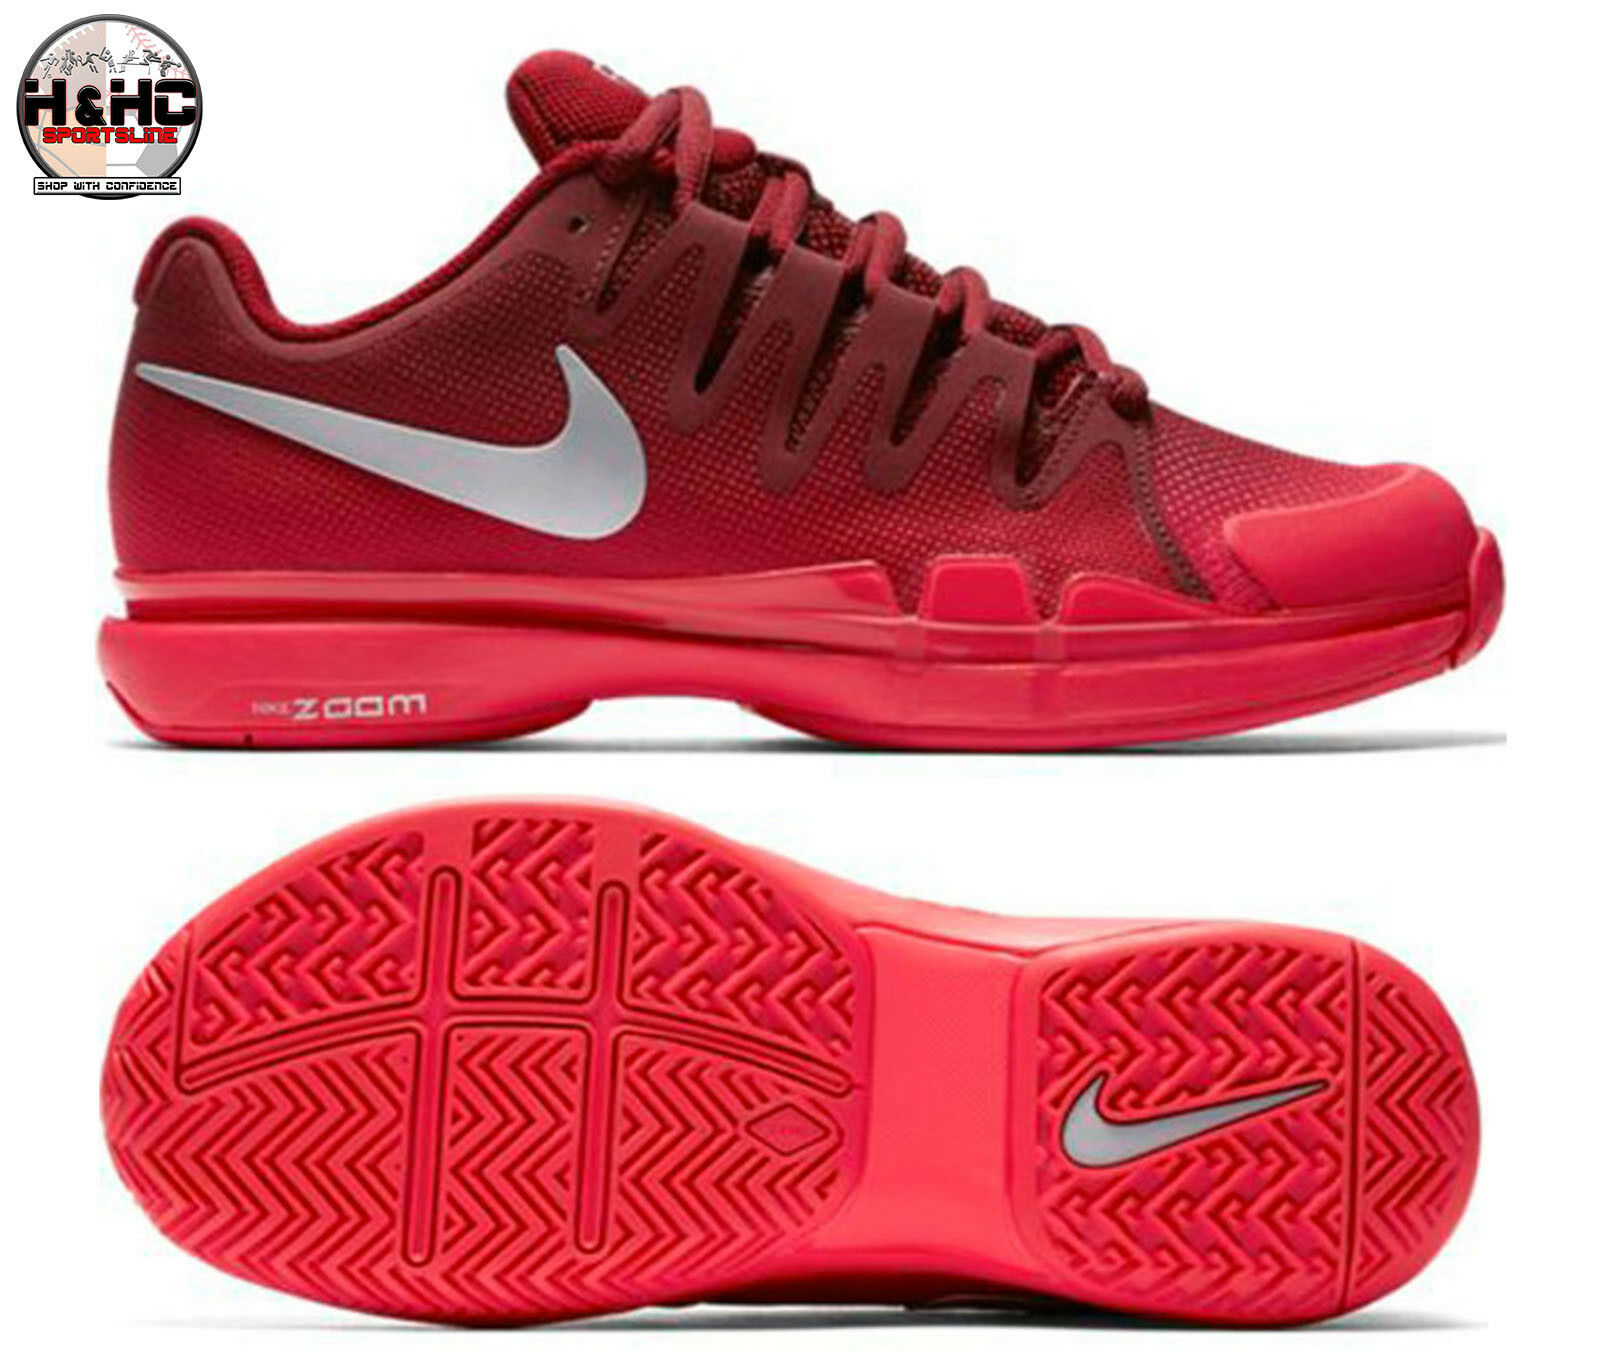 Nike Zoom Vapor 9.5 Tour 631475 602 Team Red/Silver Women's Tennis Shoes Sz 5